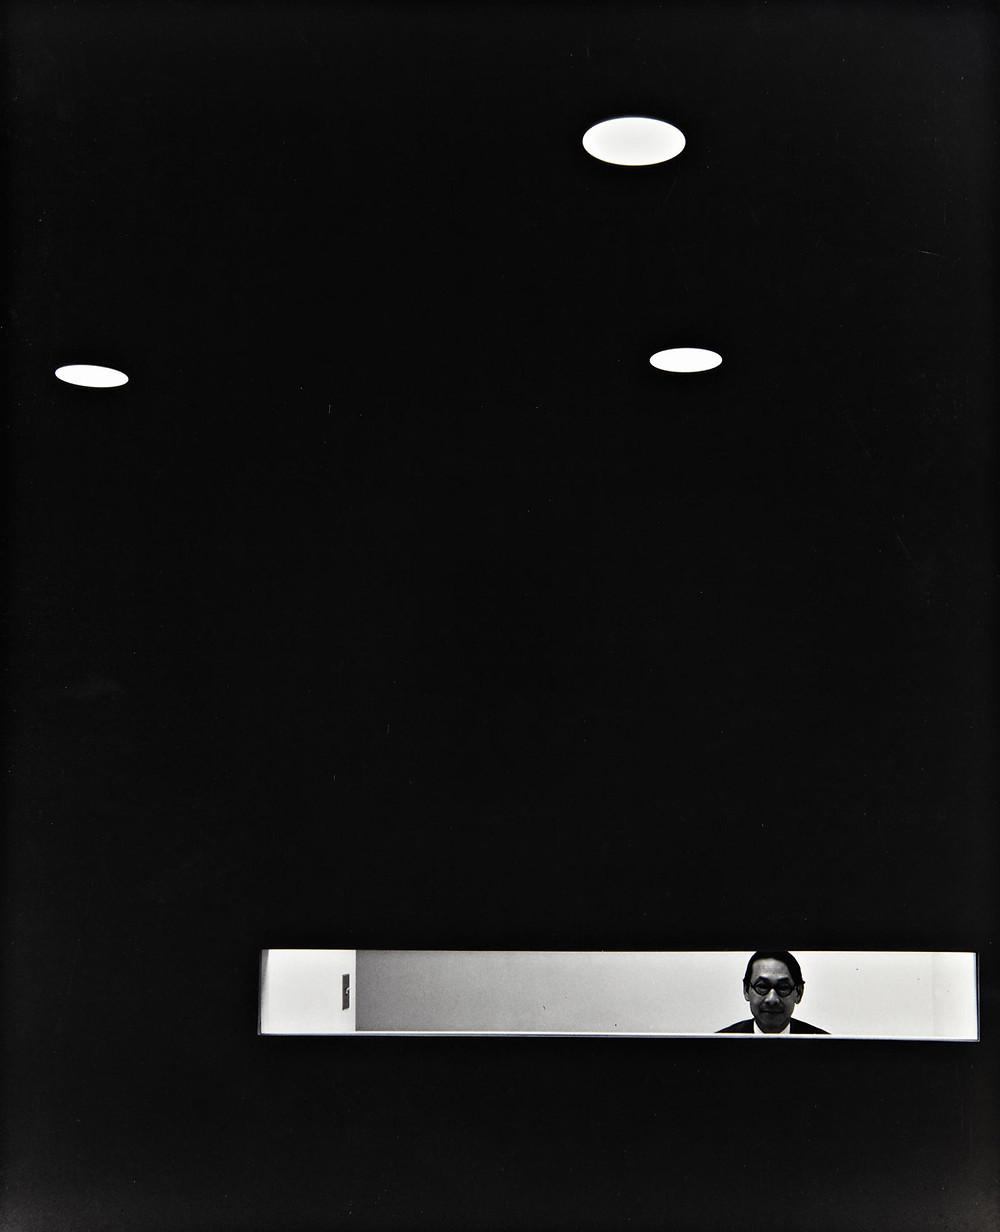 L'architetto I.M. Pei, 1967